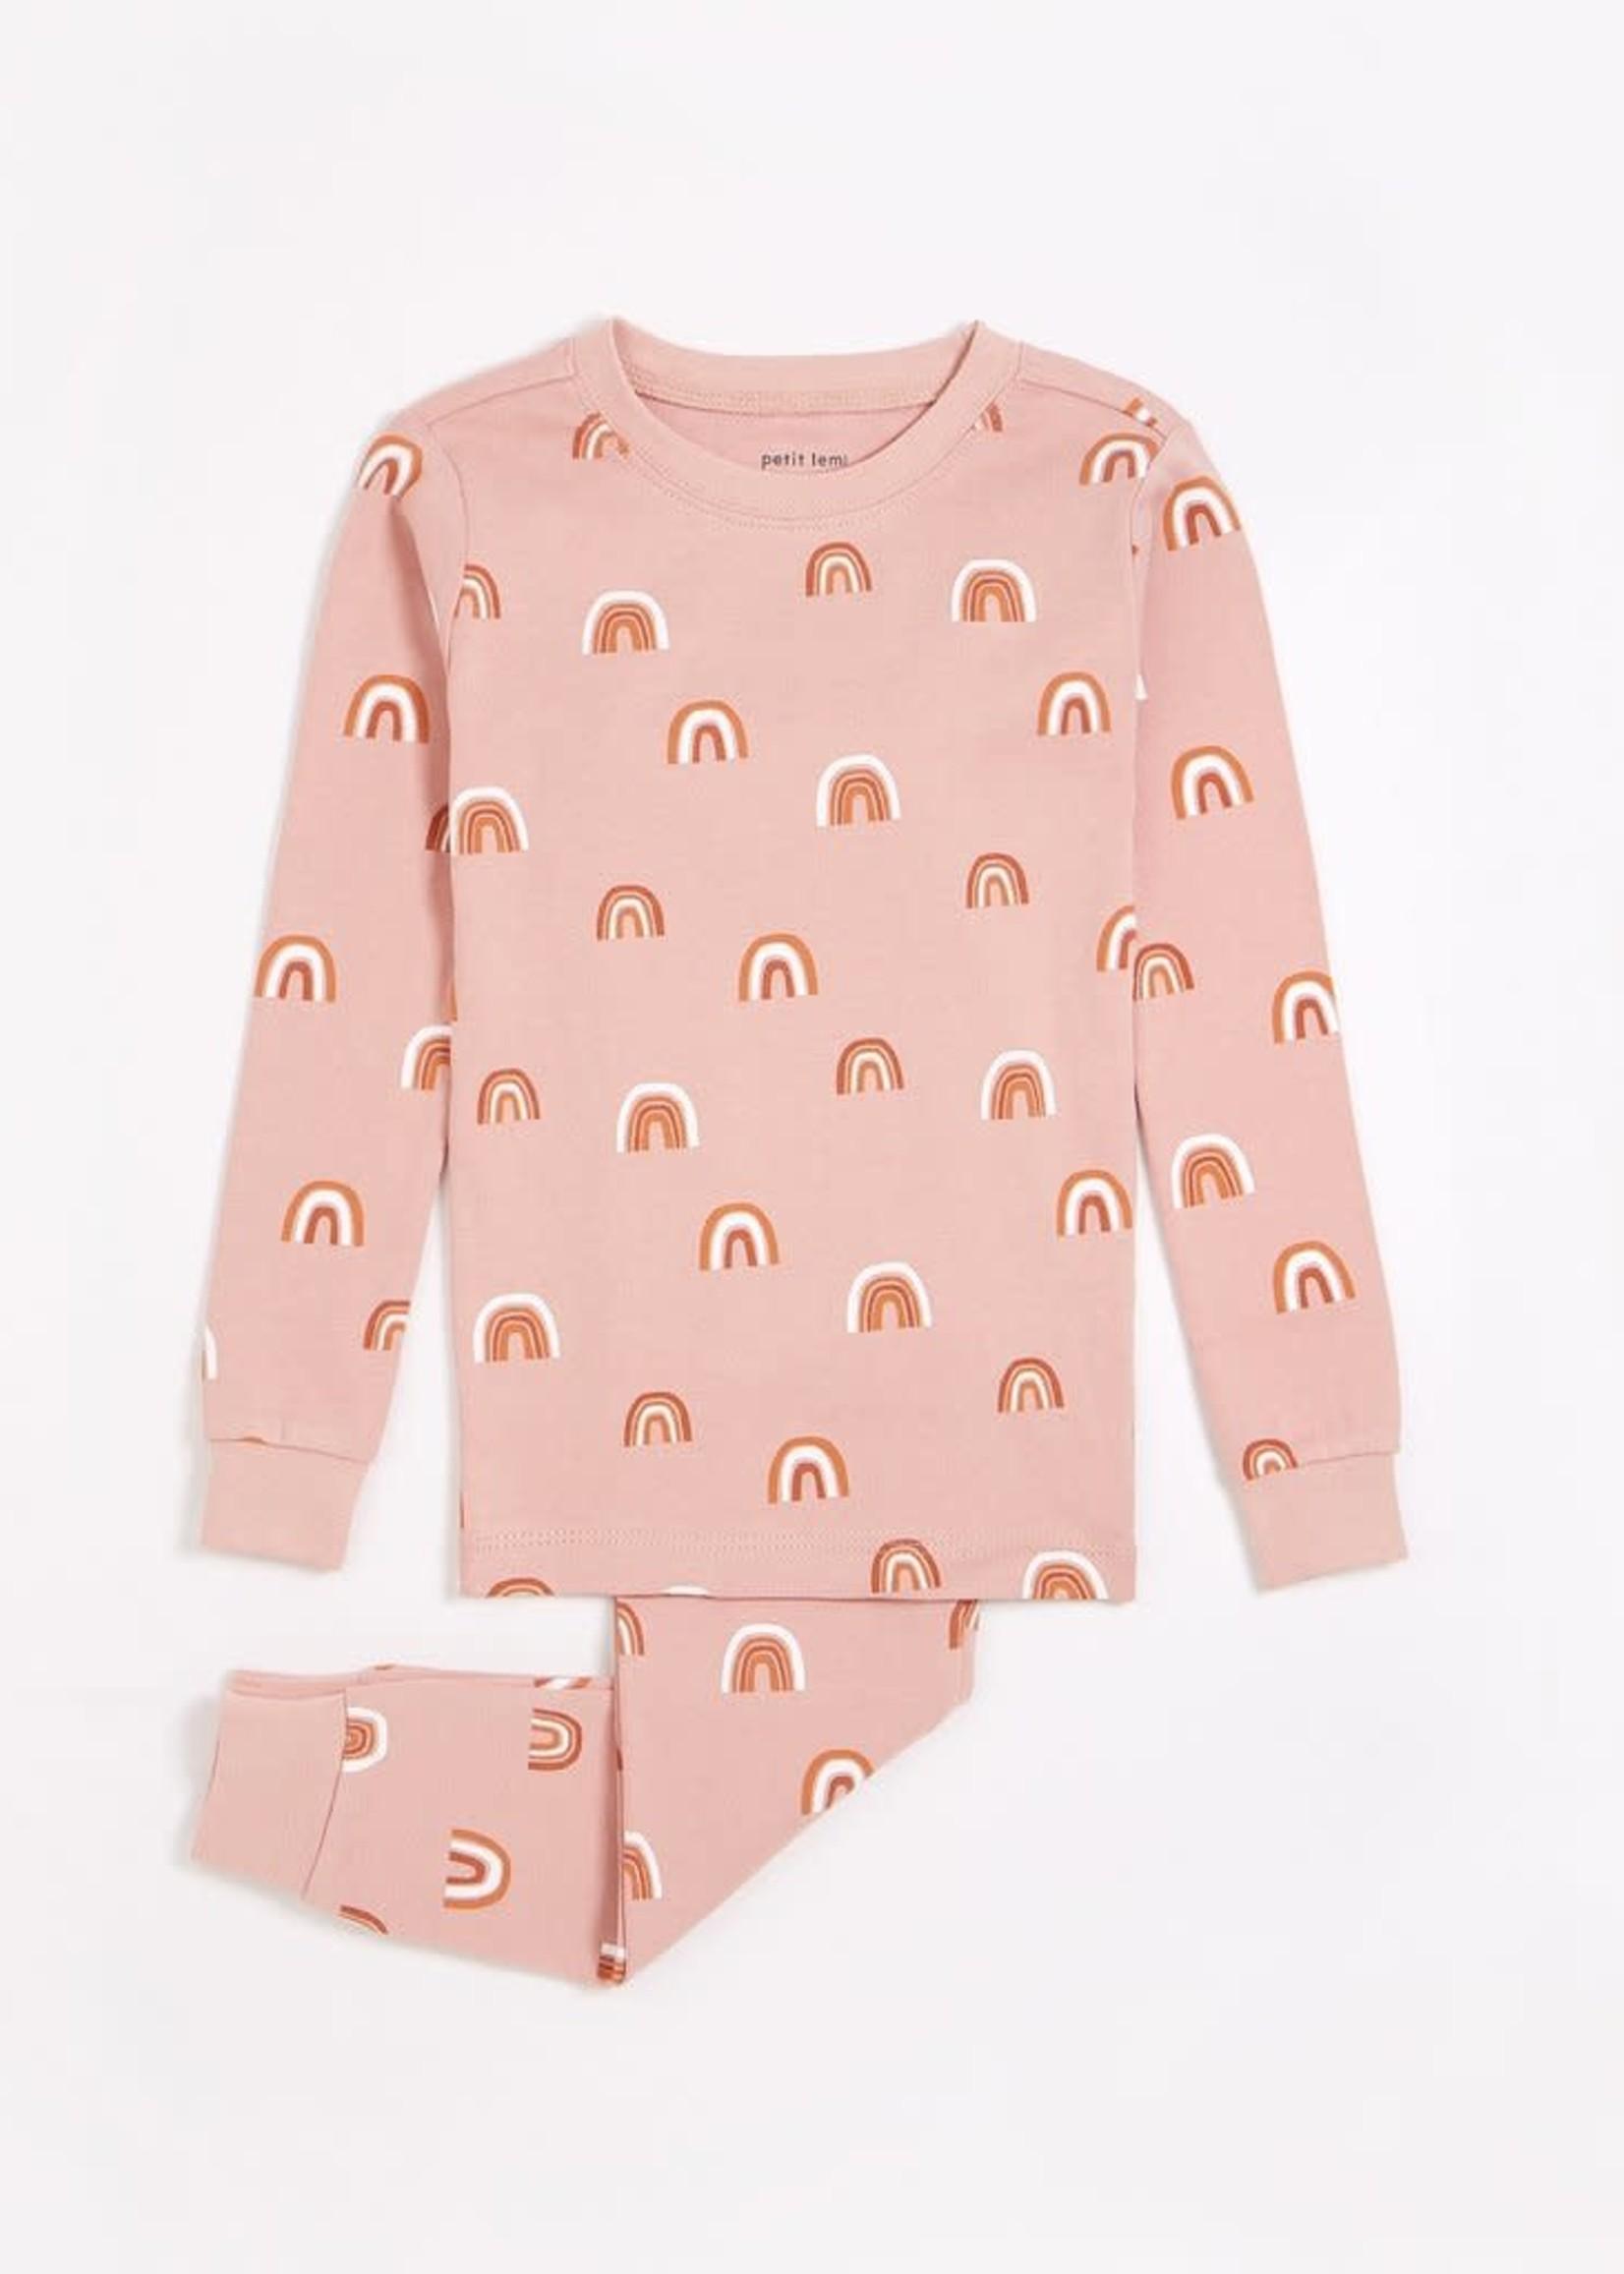 petit lem Petit Lem Rainbow Print Pink PJ Set